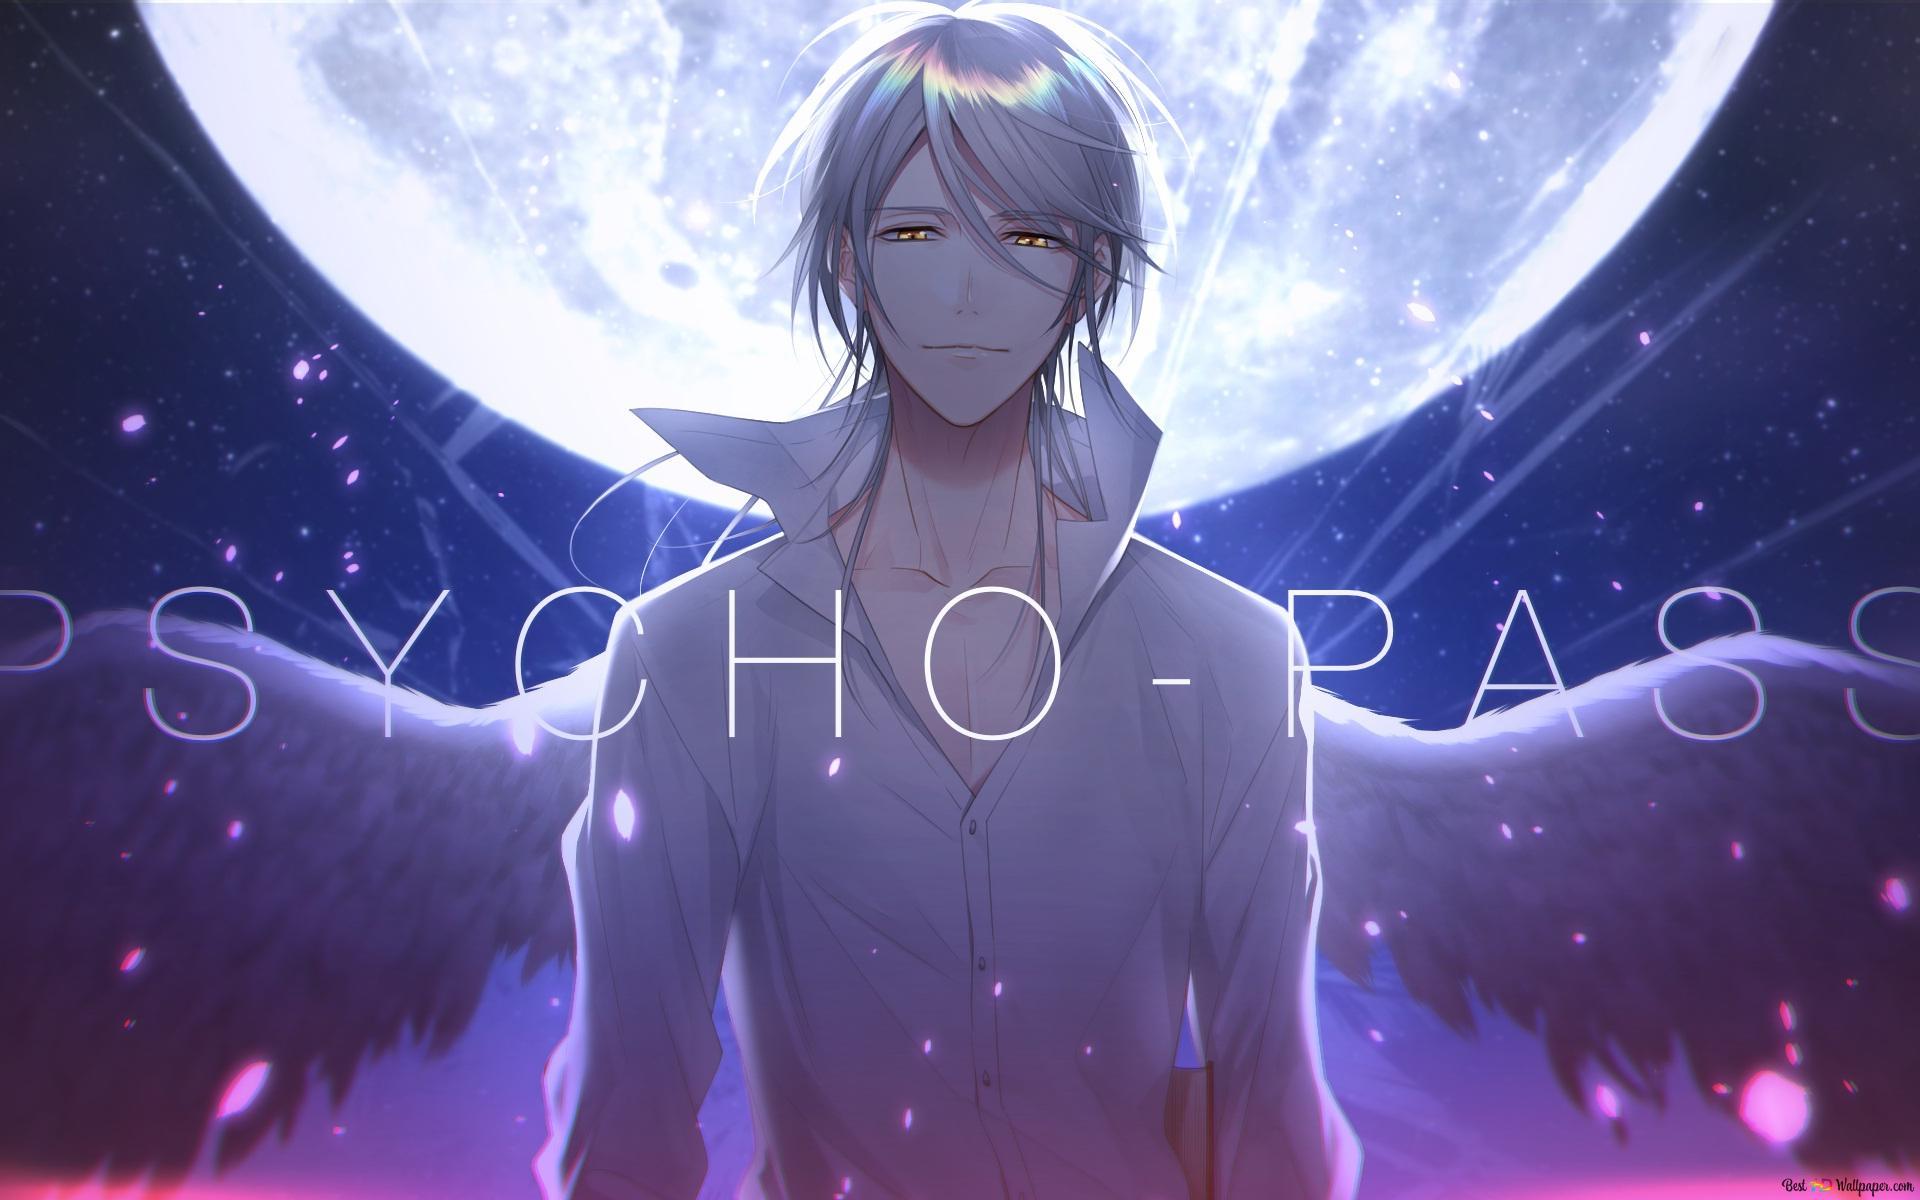 Psycho Pass Shougo Makishima Hd Wallpaper Download